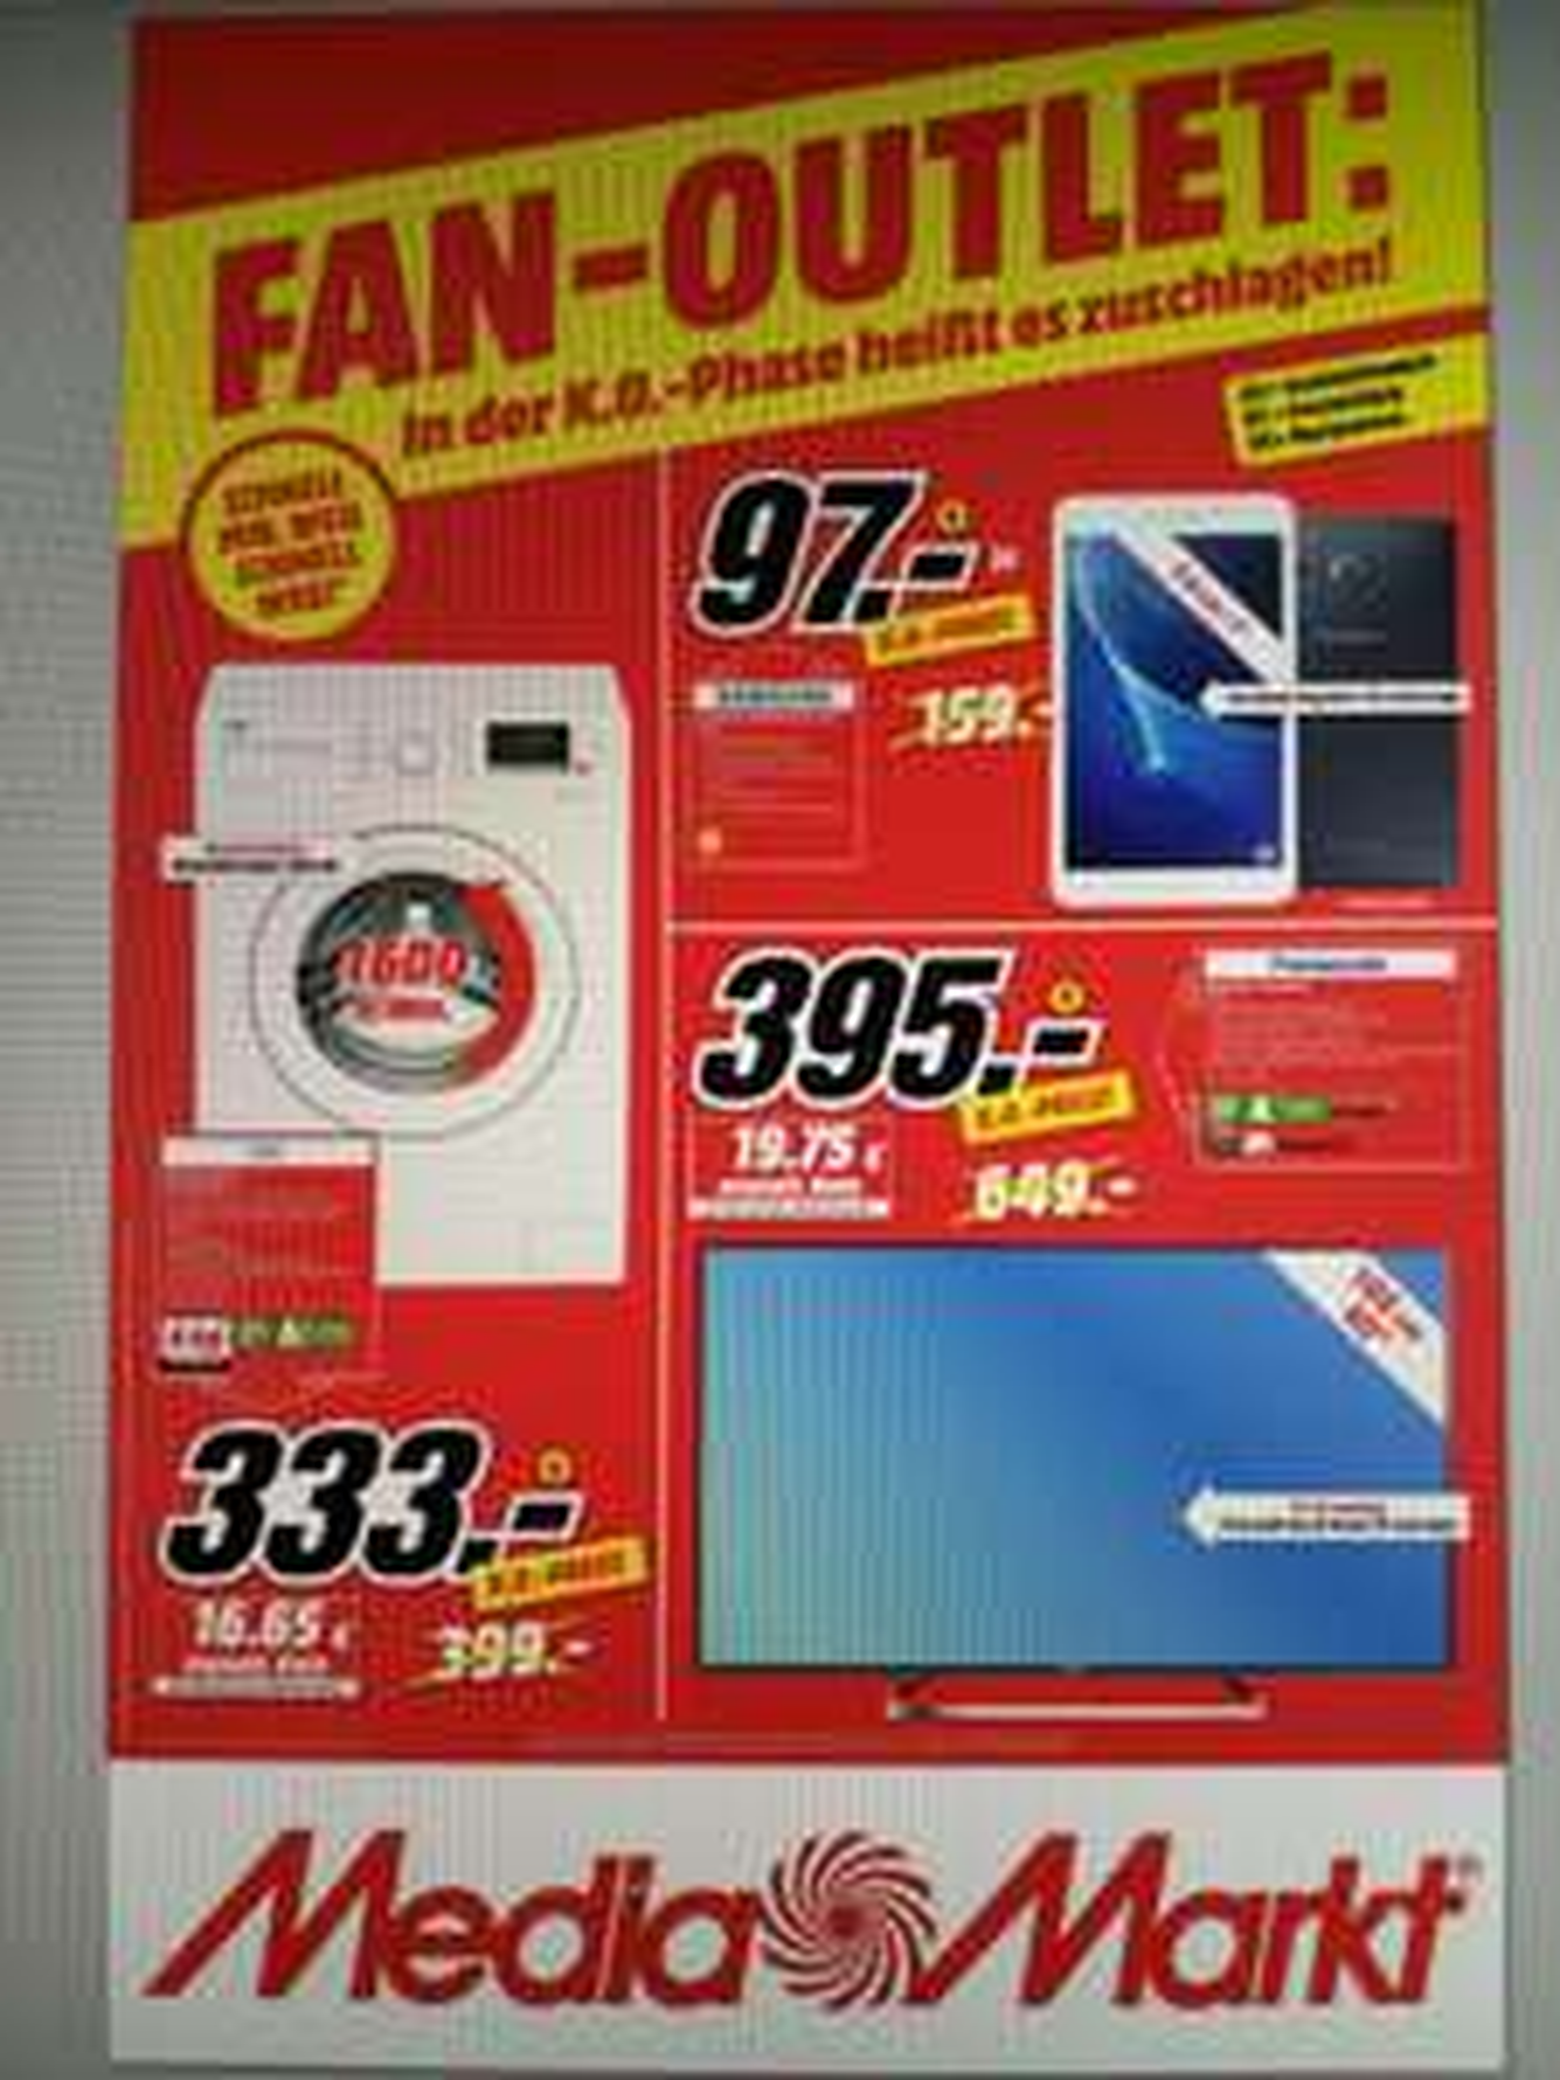 [Lokal Lingen/Meppen] Mediamarkt - Destiny 2 PC 5€ / X BOX One X 399€ / Kenwood KCC 9040 + Zubehör 895€